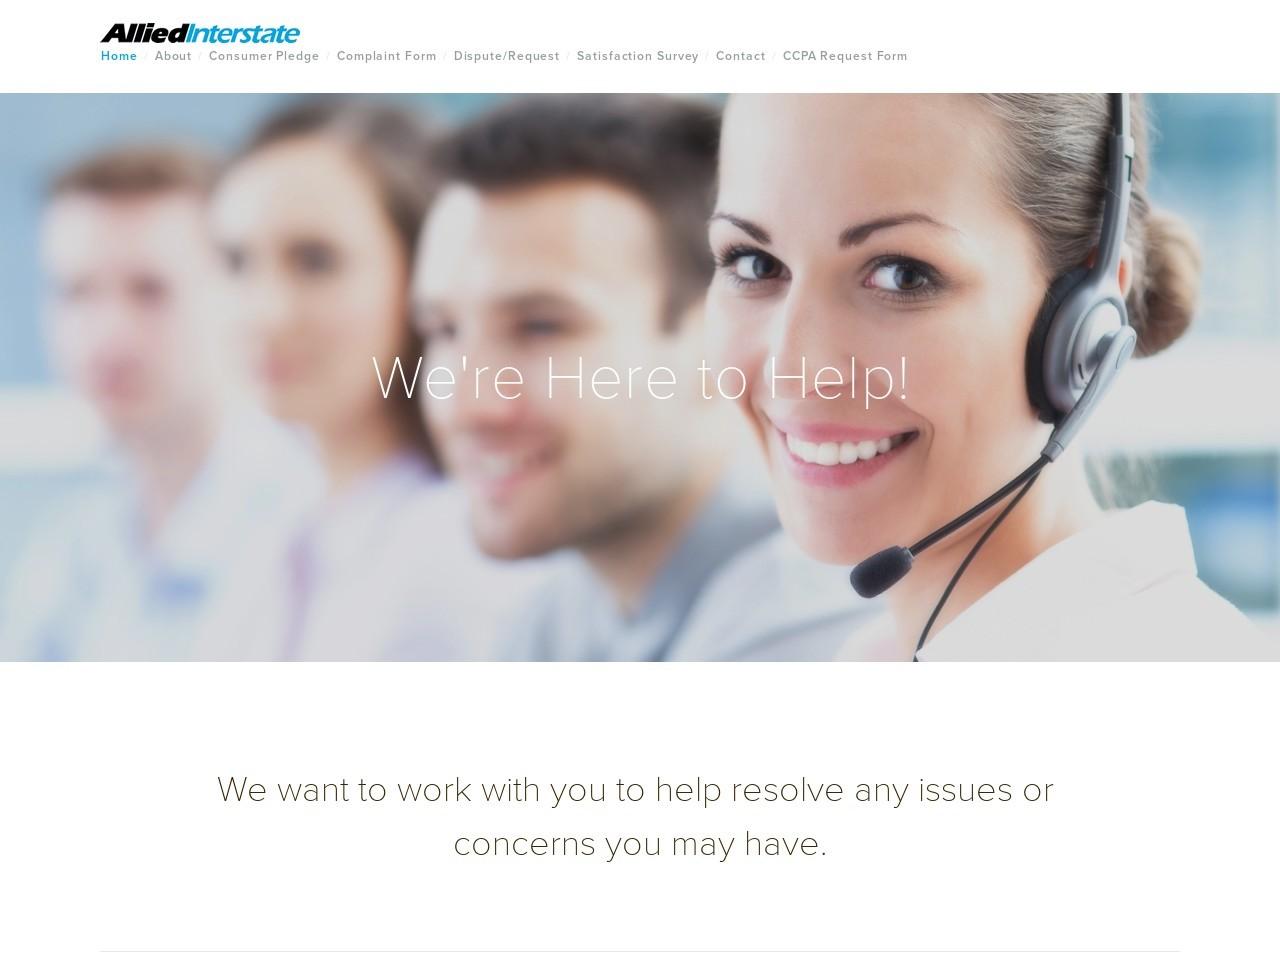 allied-interstate.com